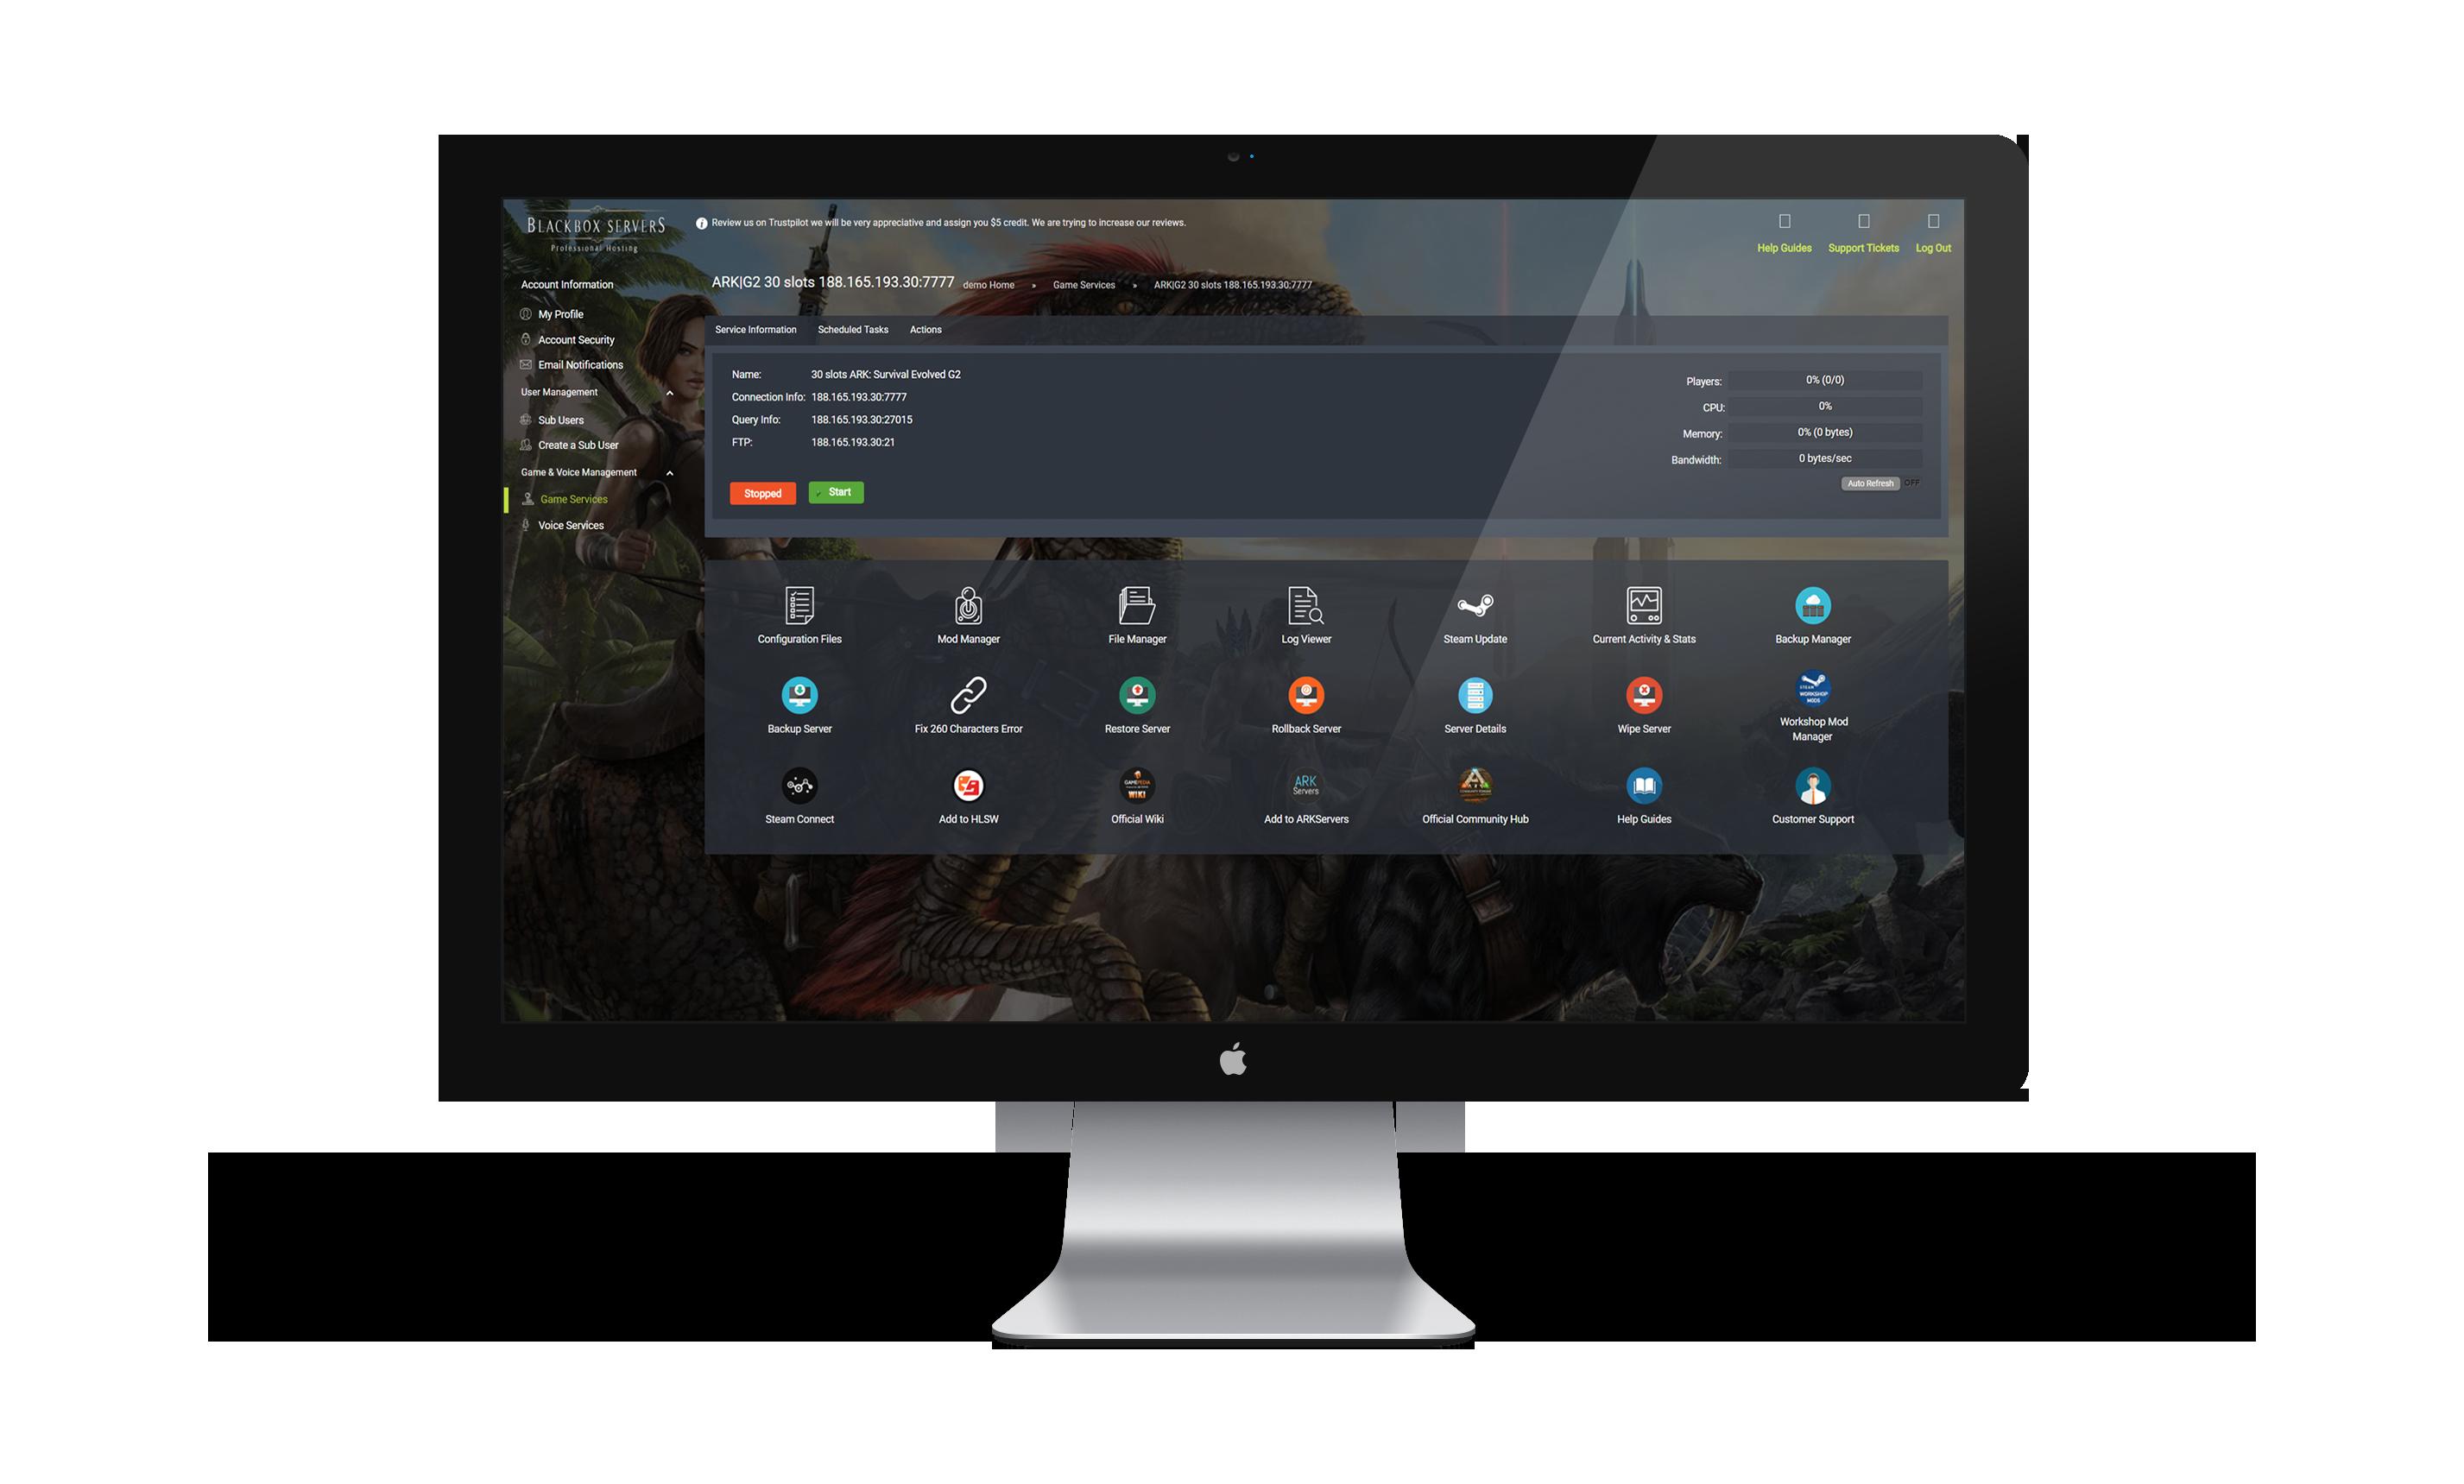 blackbox control panel screen